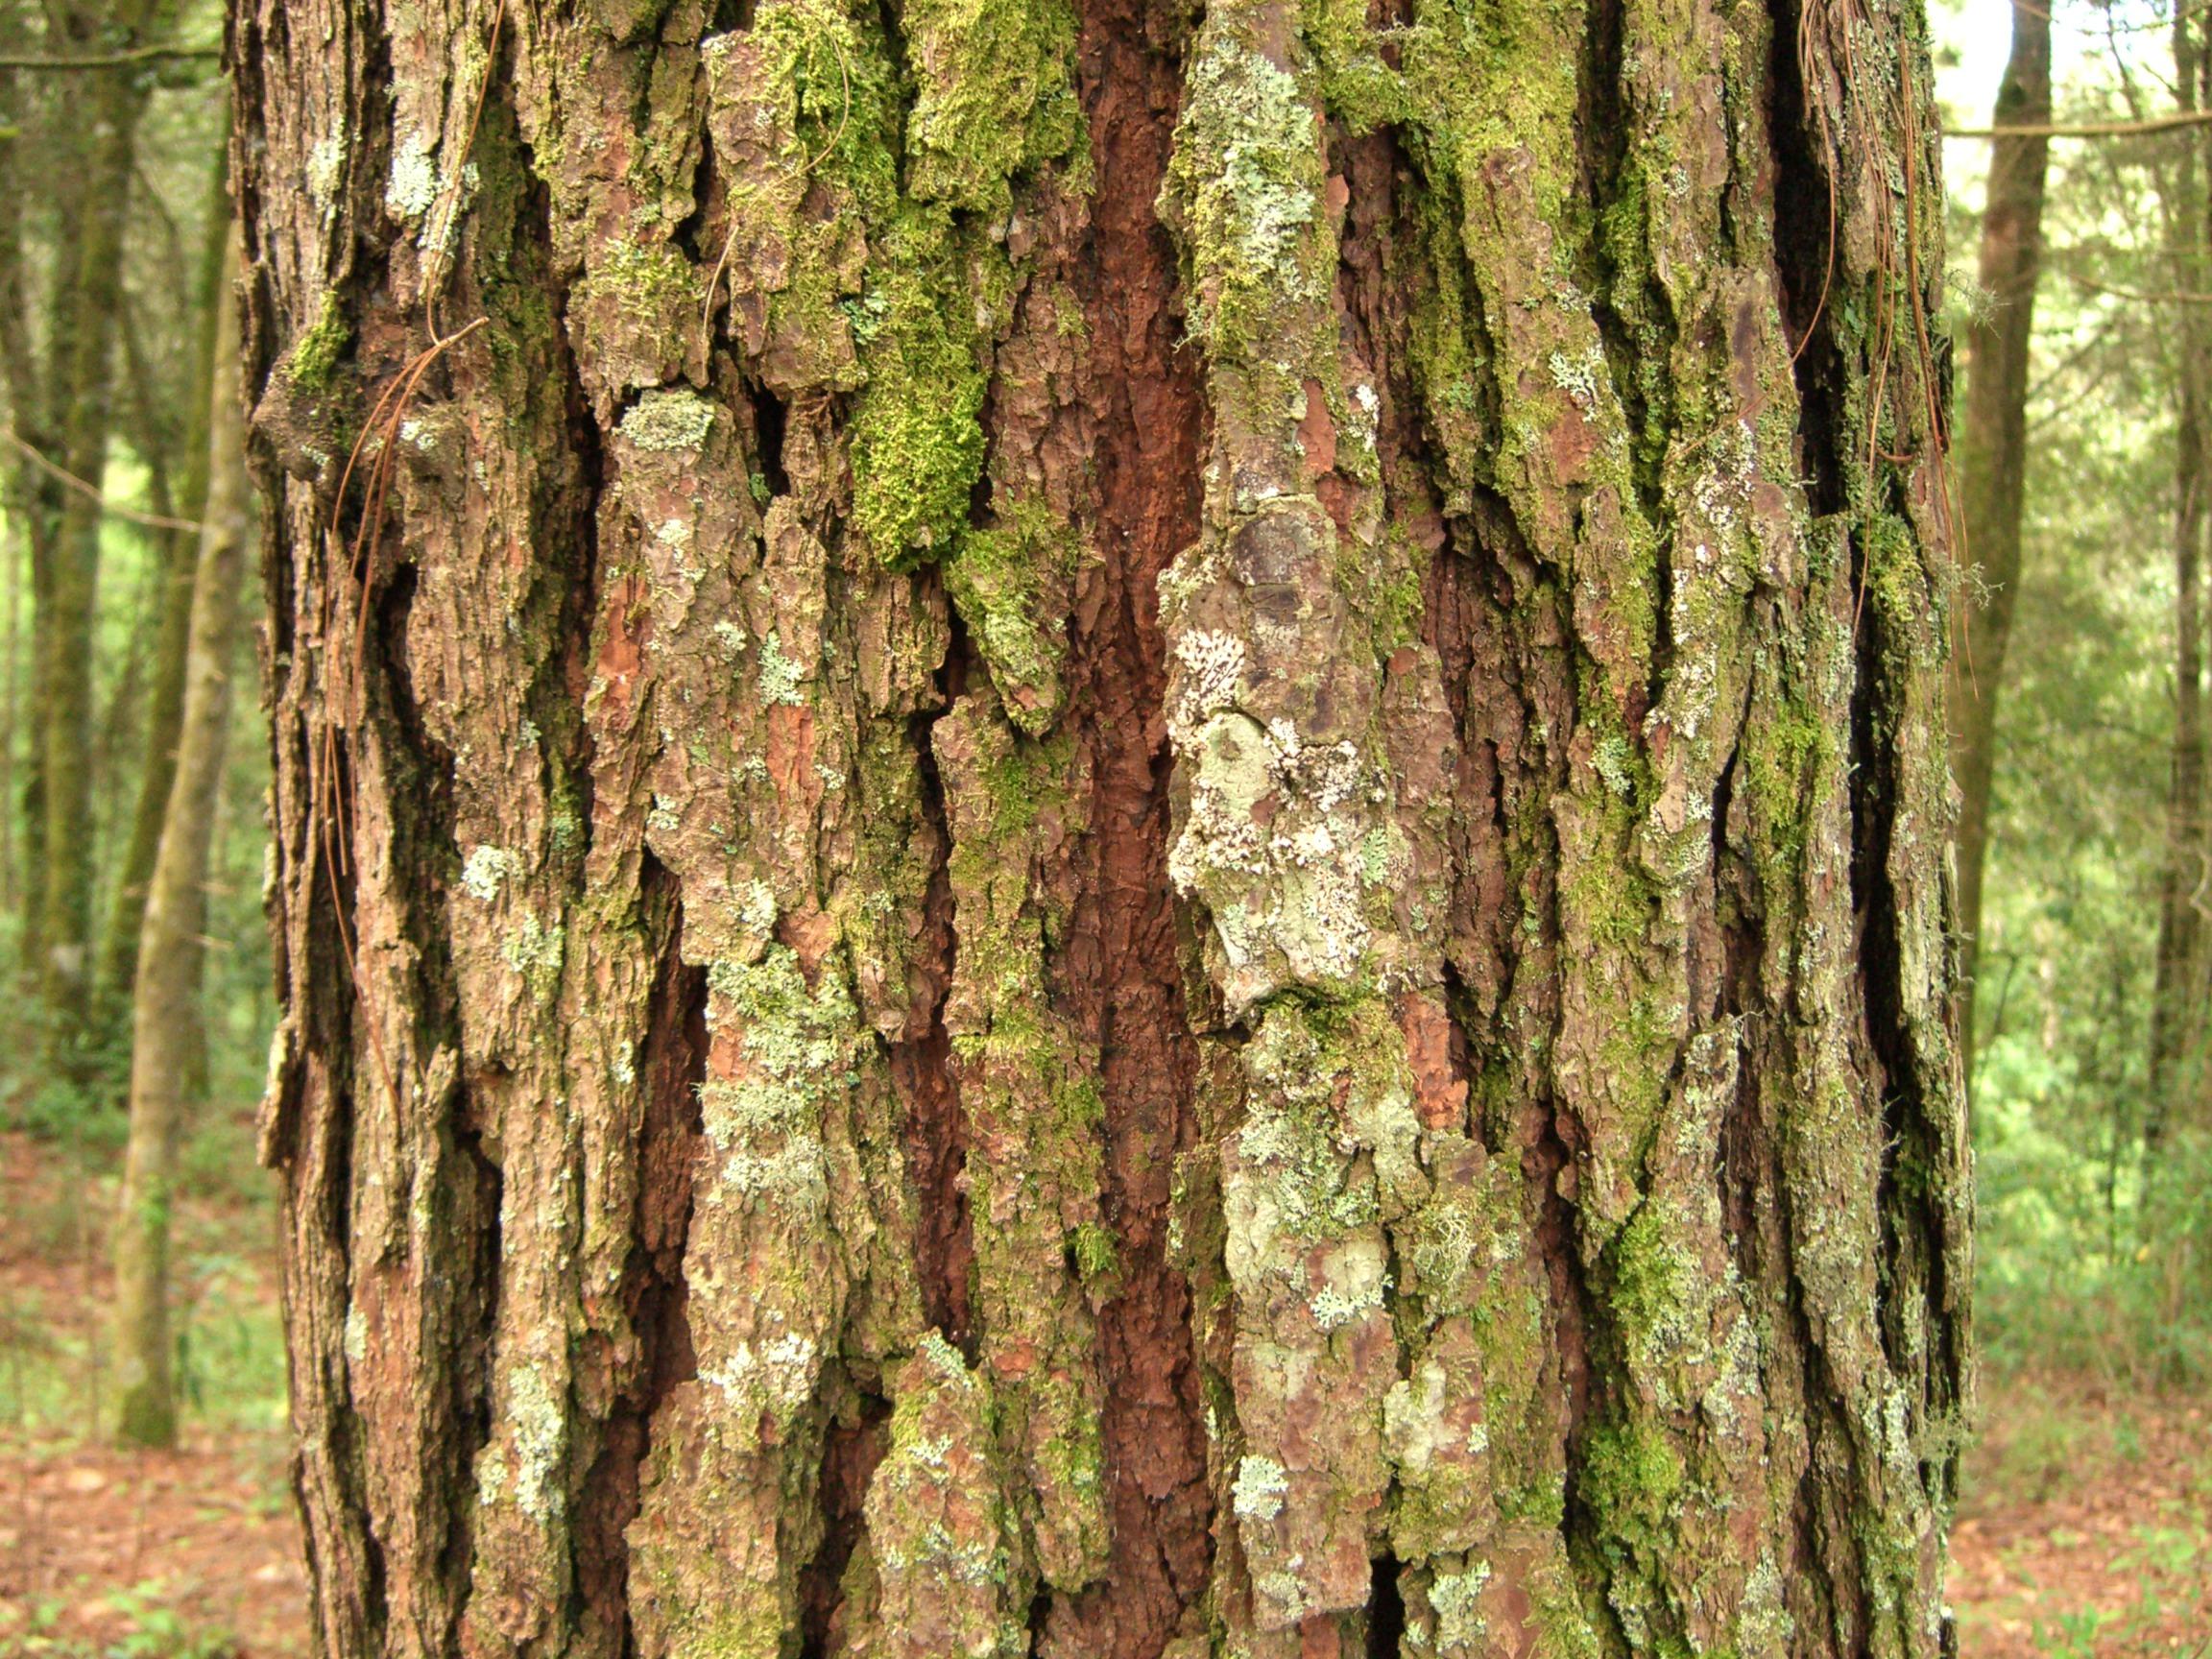 File:Pine bark tecpan guatemala JPG - Wikipedia